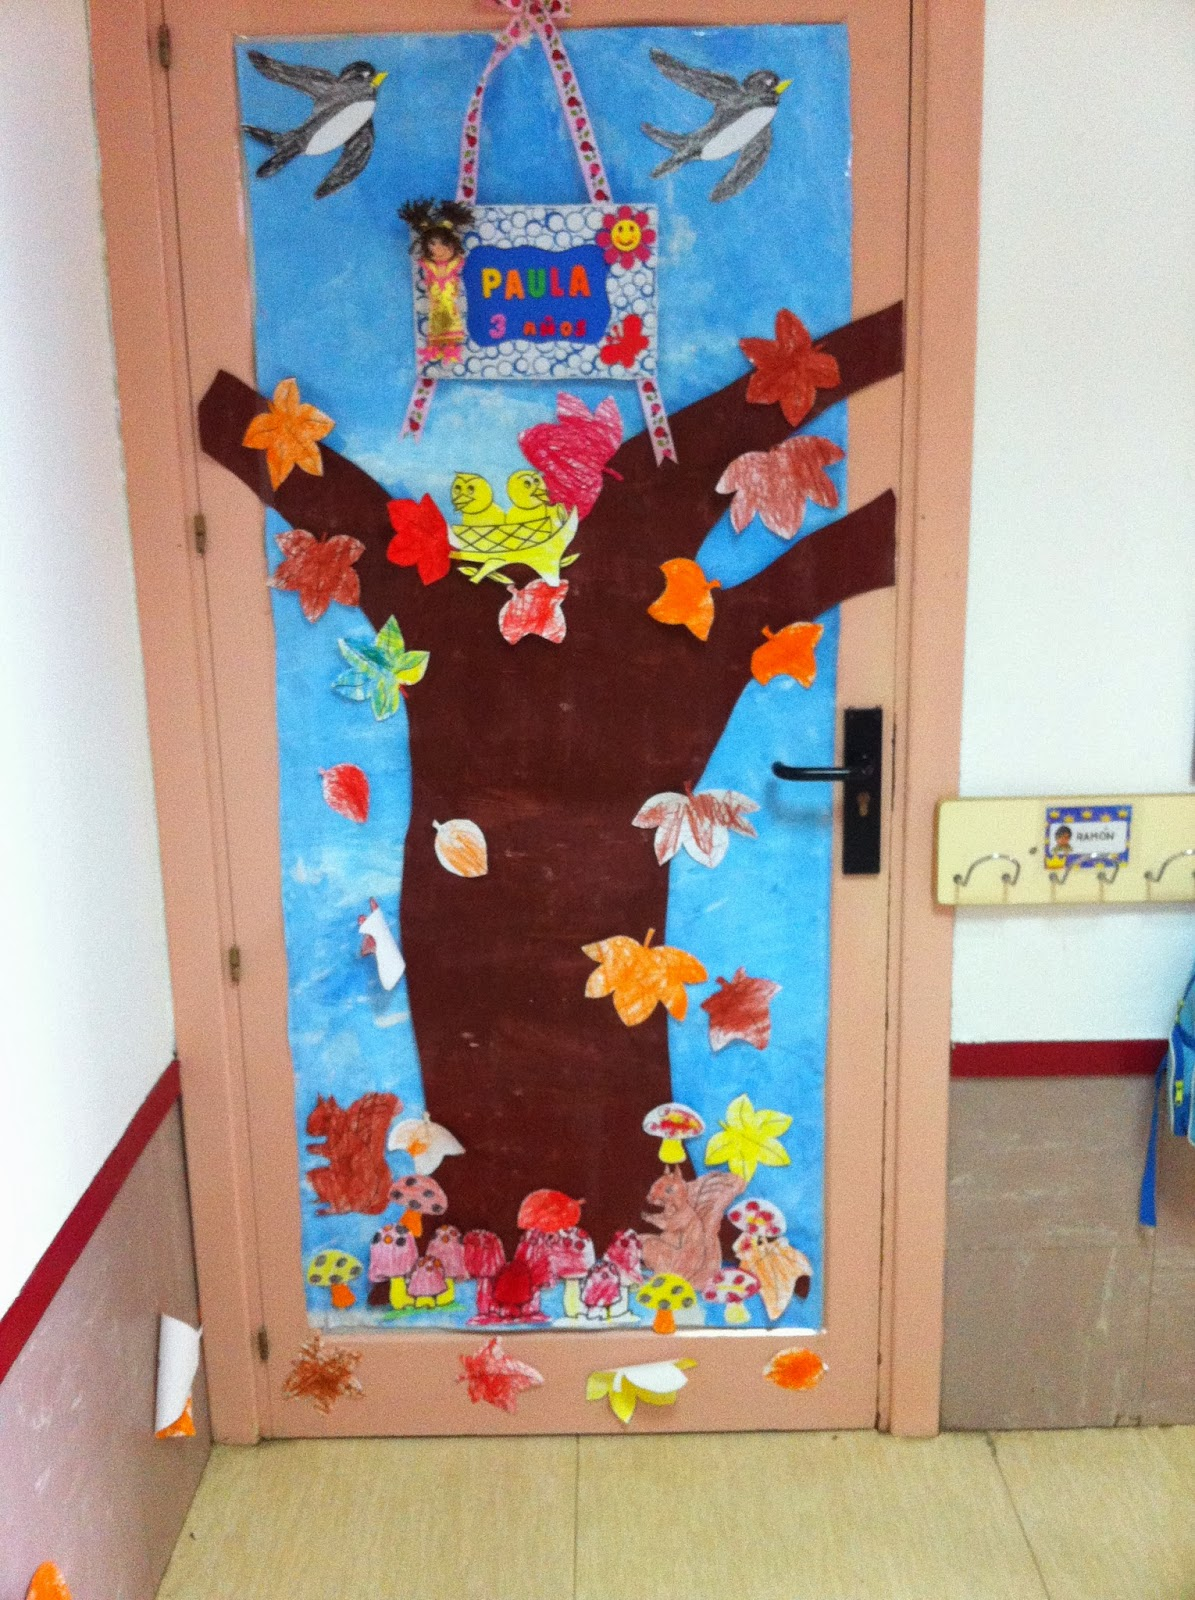 Infantil antonio osuna 3 a os decoraci n de oto o en la for Decoracion otono infantil